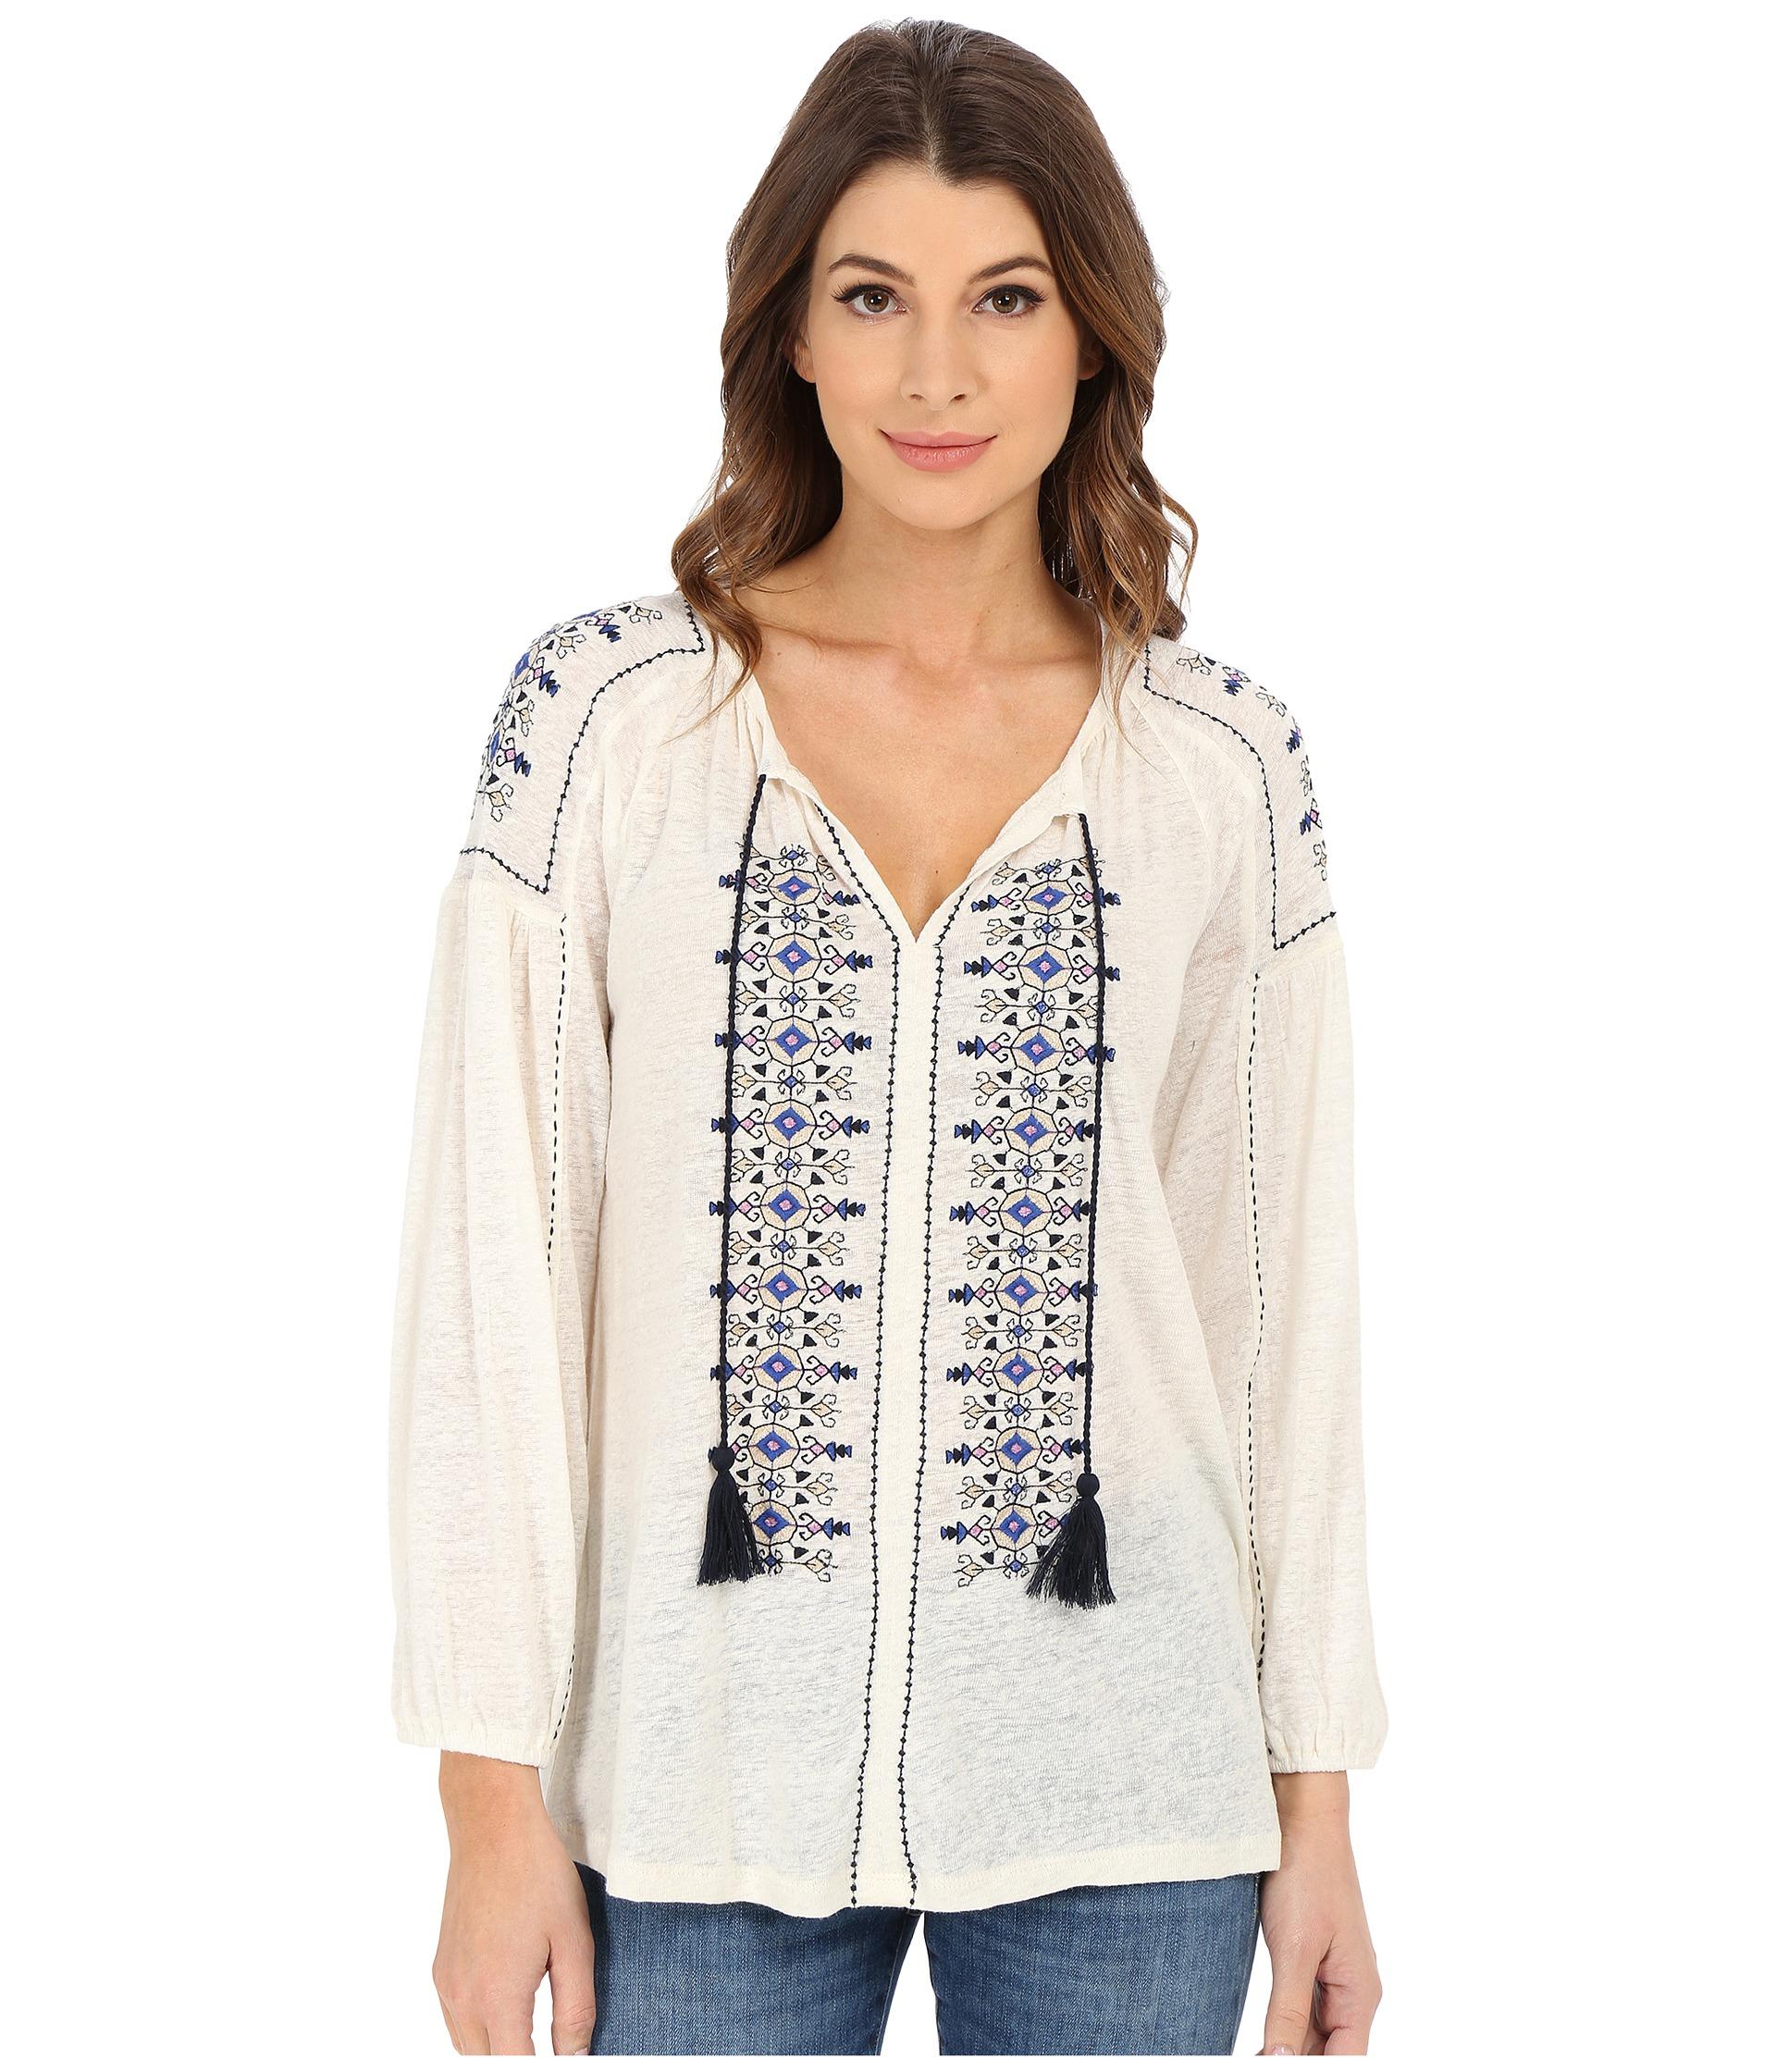 4e378570eb4e Lyst - Lucky Brand Embroidered Peasant Top in White